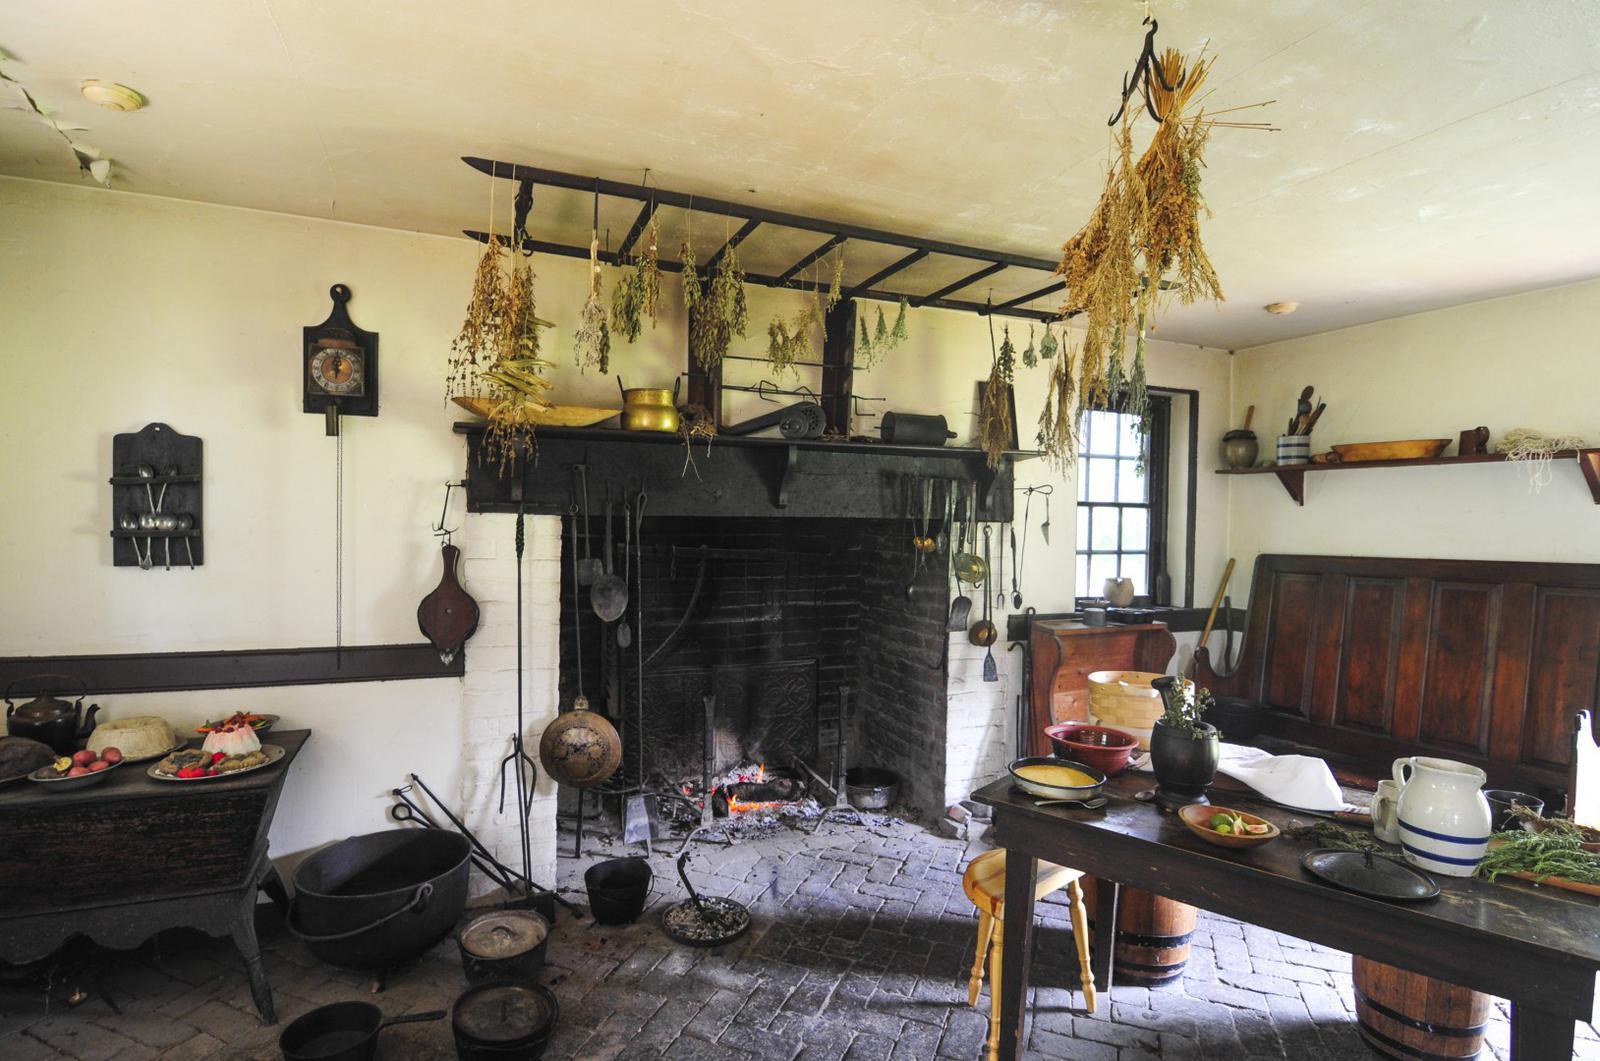 George Washington's home - how cozy!